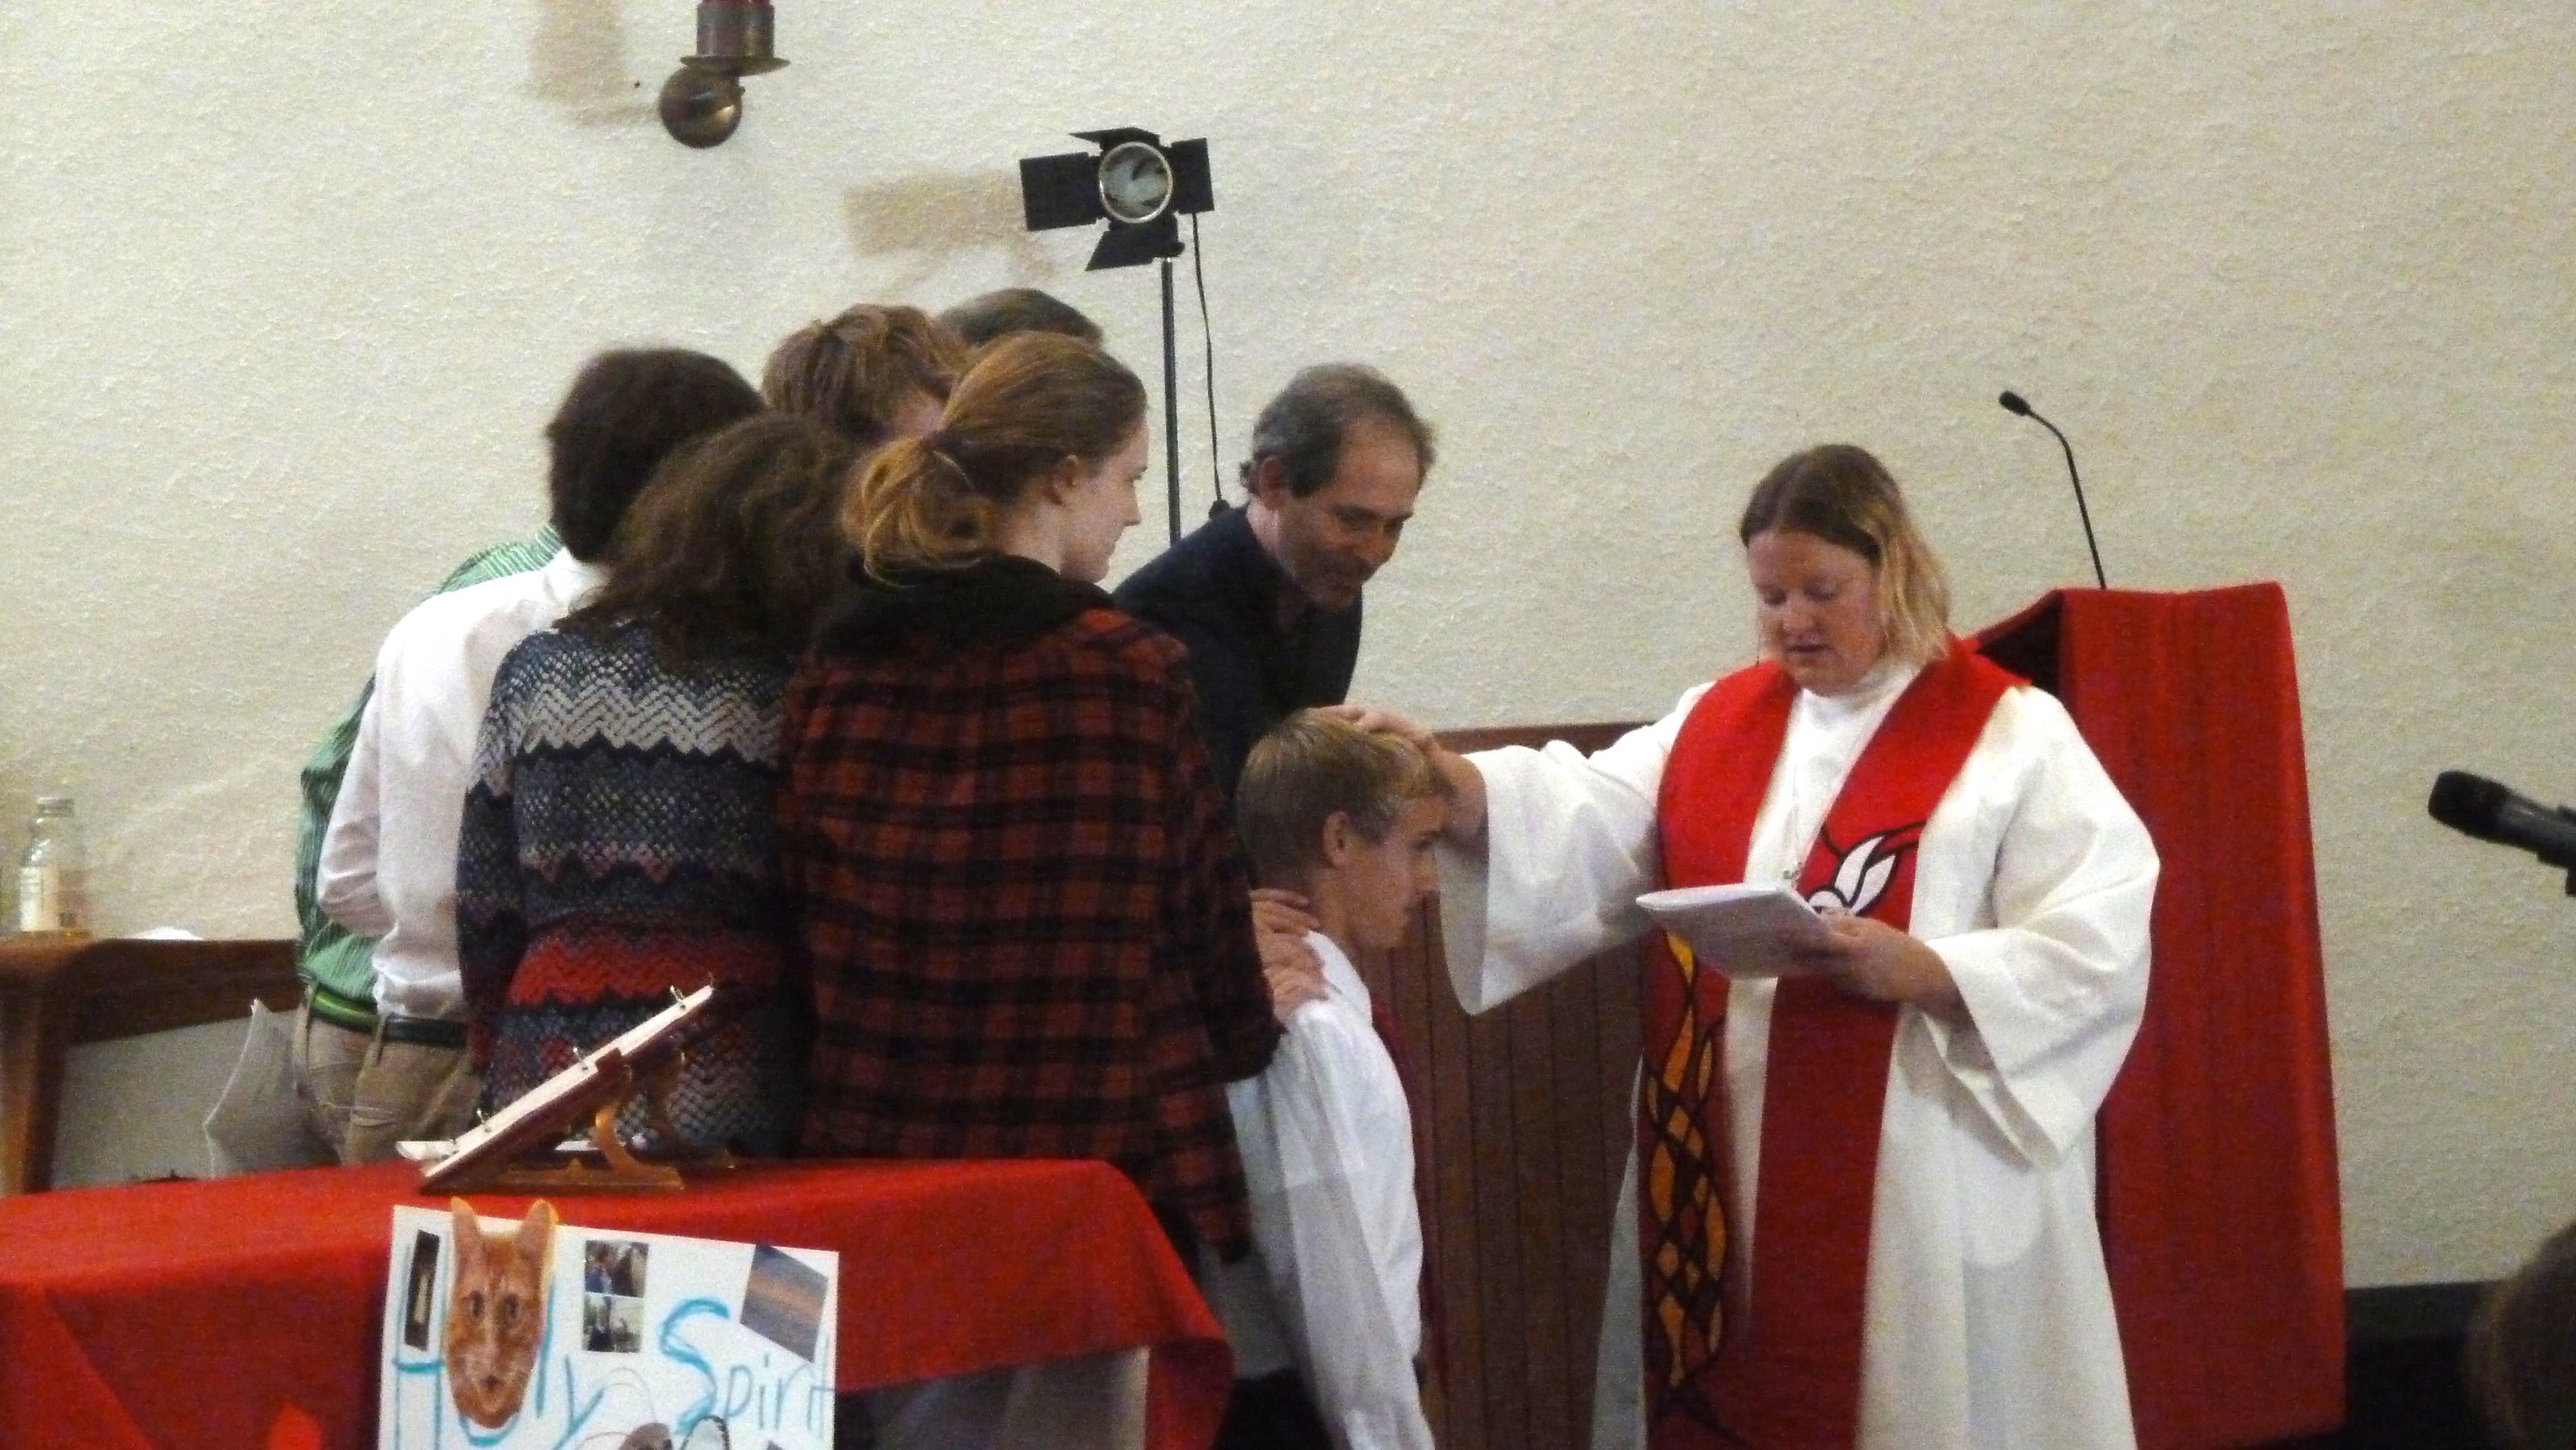 2015-05-24 Pentecost-Henry-Anderson-Confirmation 32.JPG